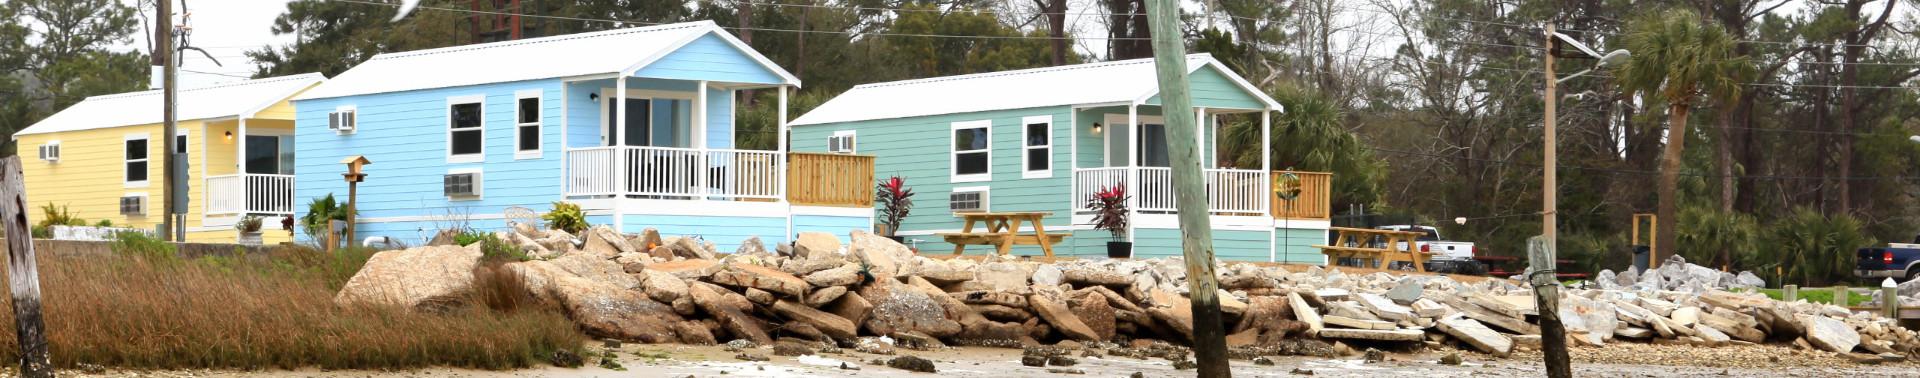 Forgotten Coast Cottages Bayfront Vacation Rentals